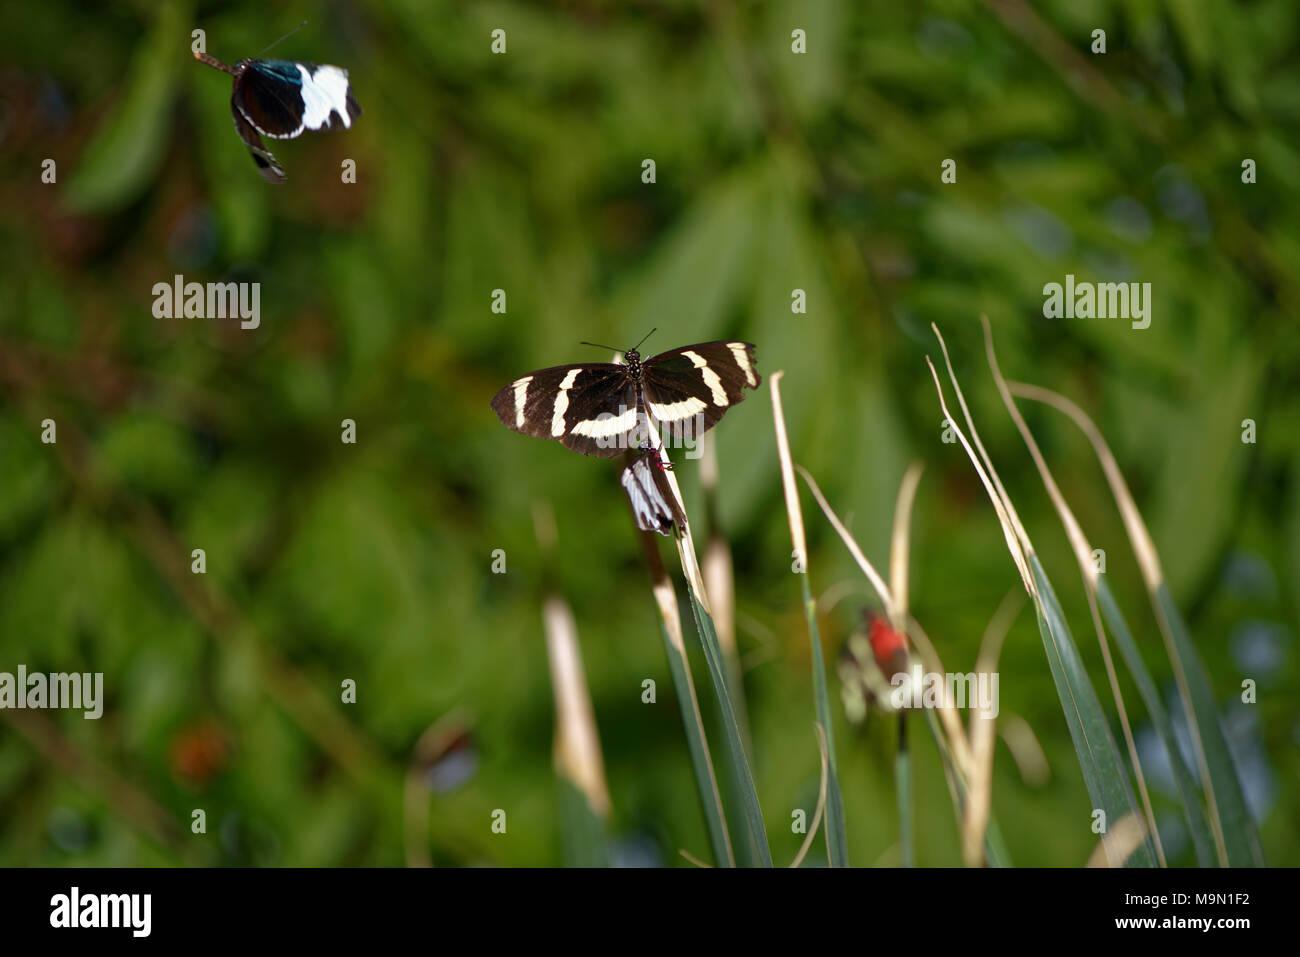 Diurnal Butterfly In Herrenhausen Gardens Hanover Germany